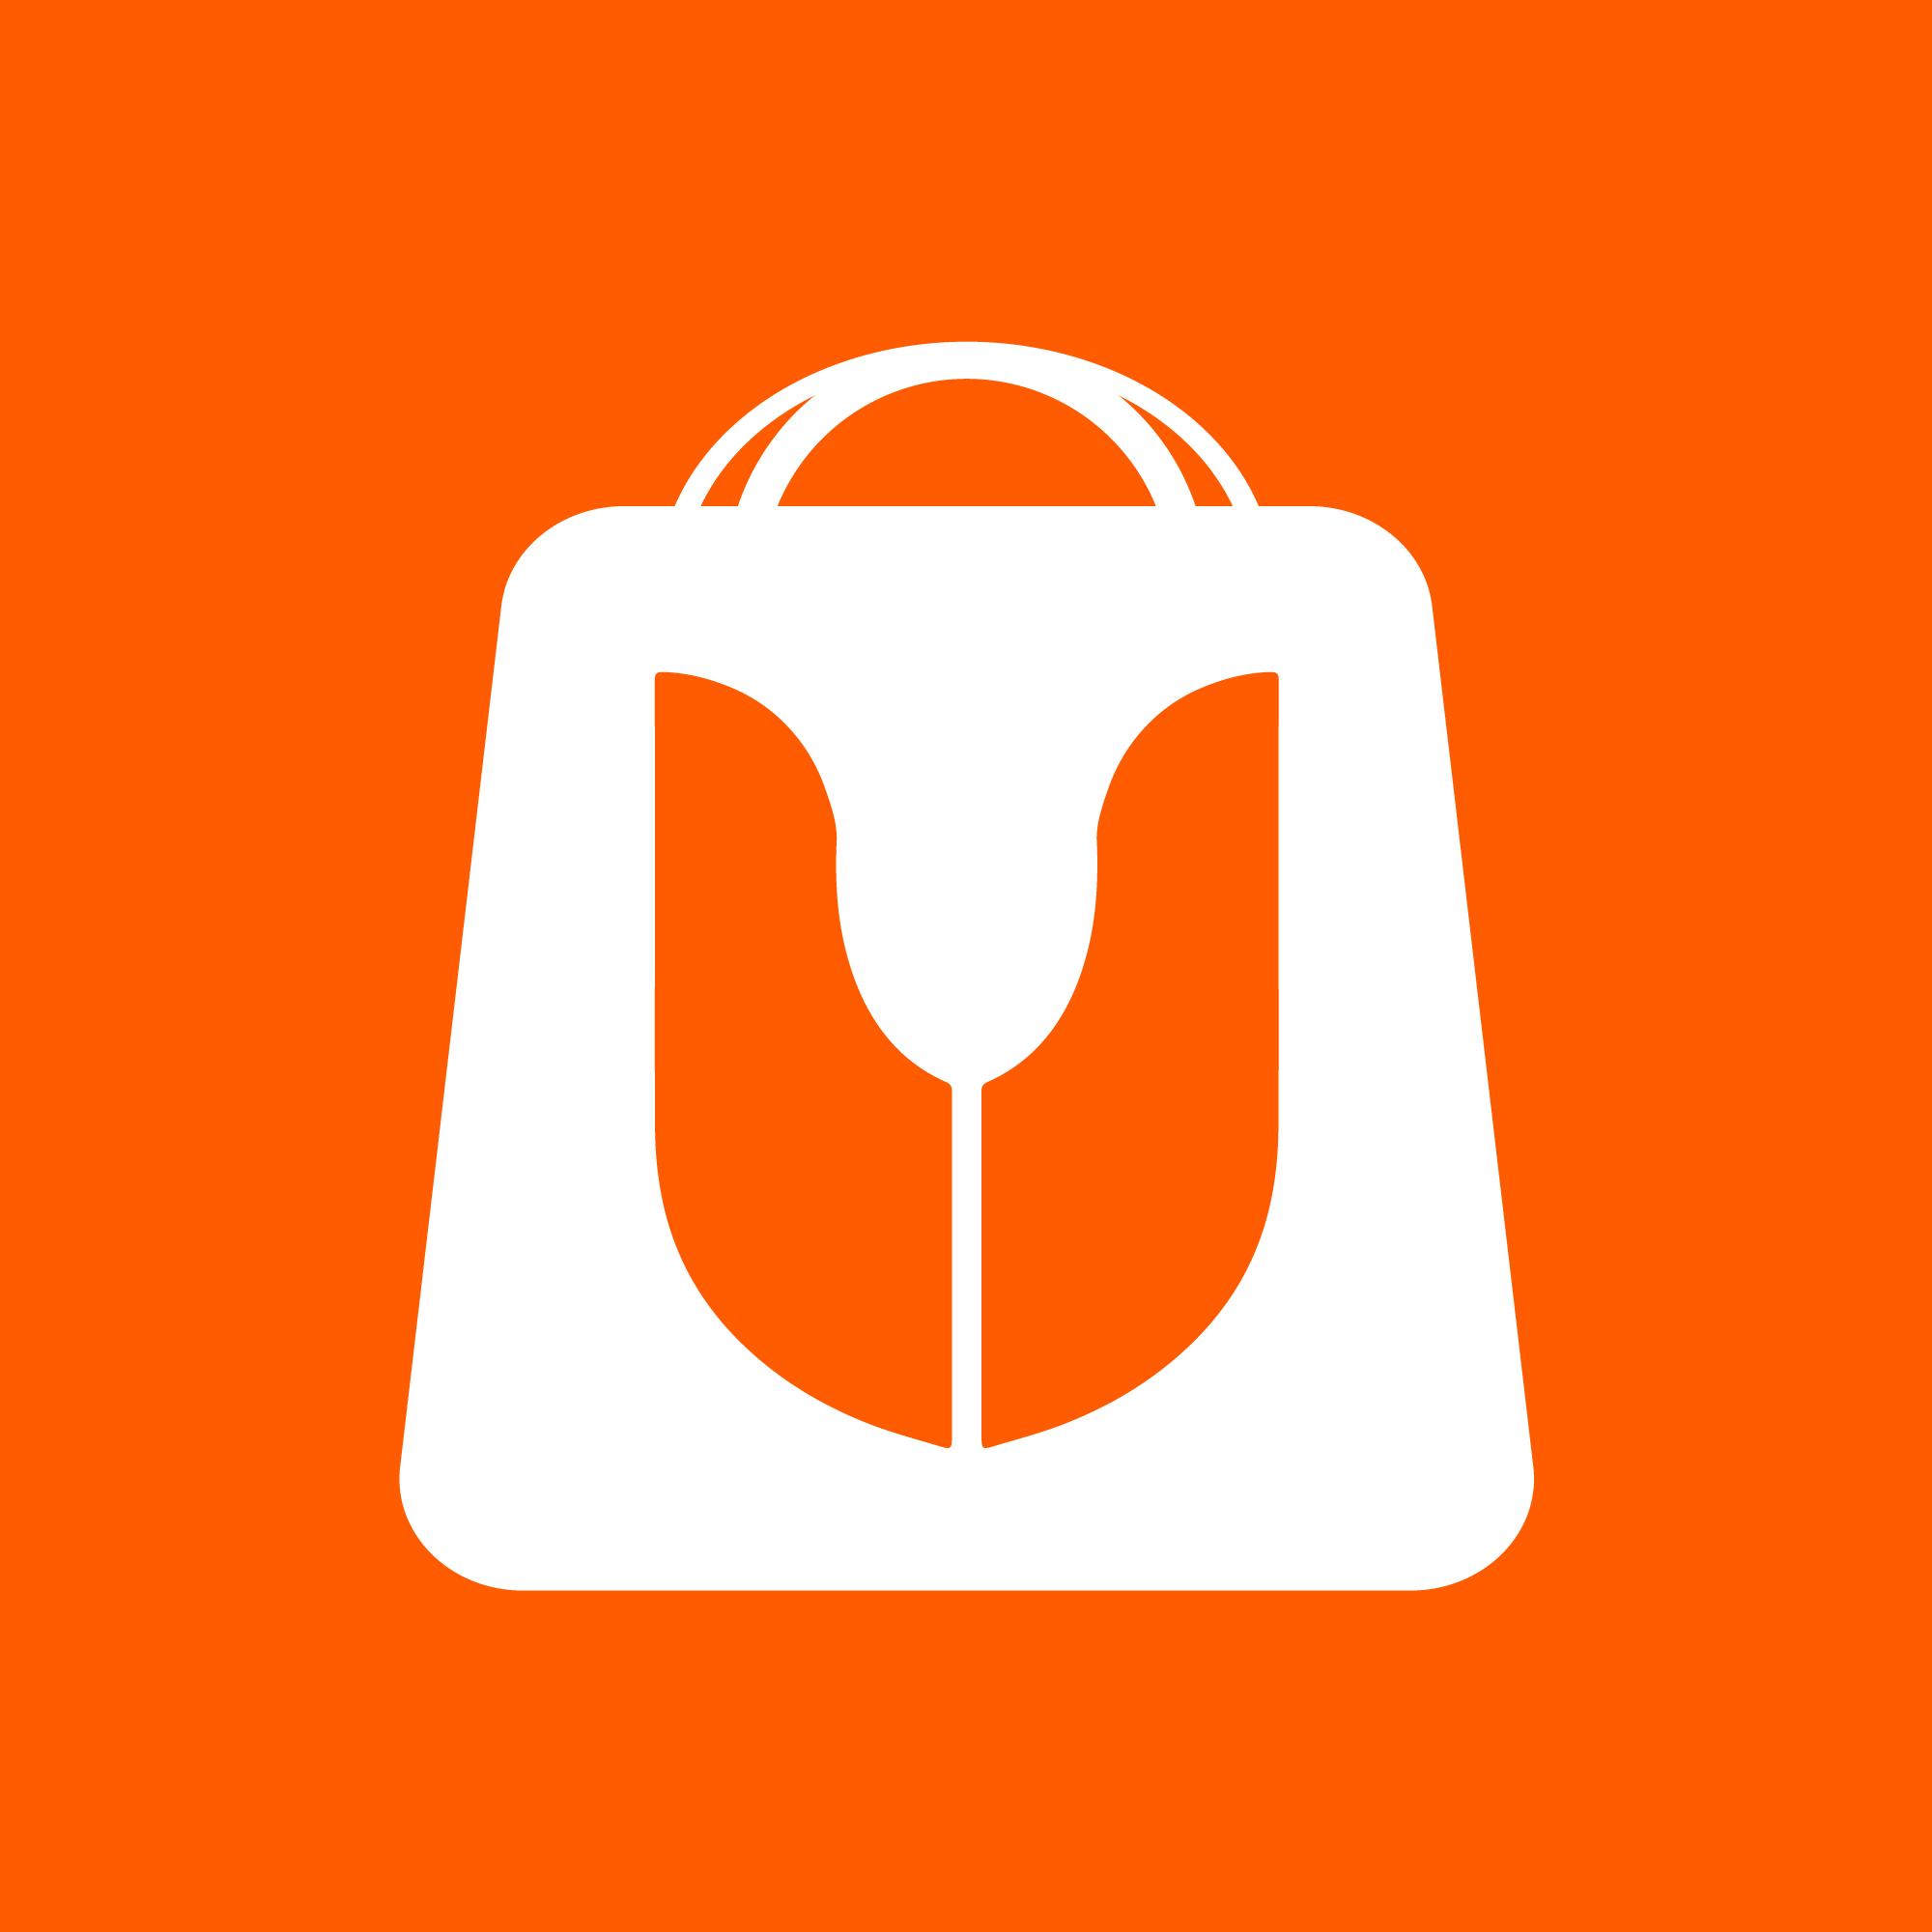 �V州市雄山科技有限公司logo